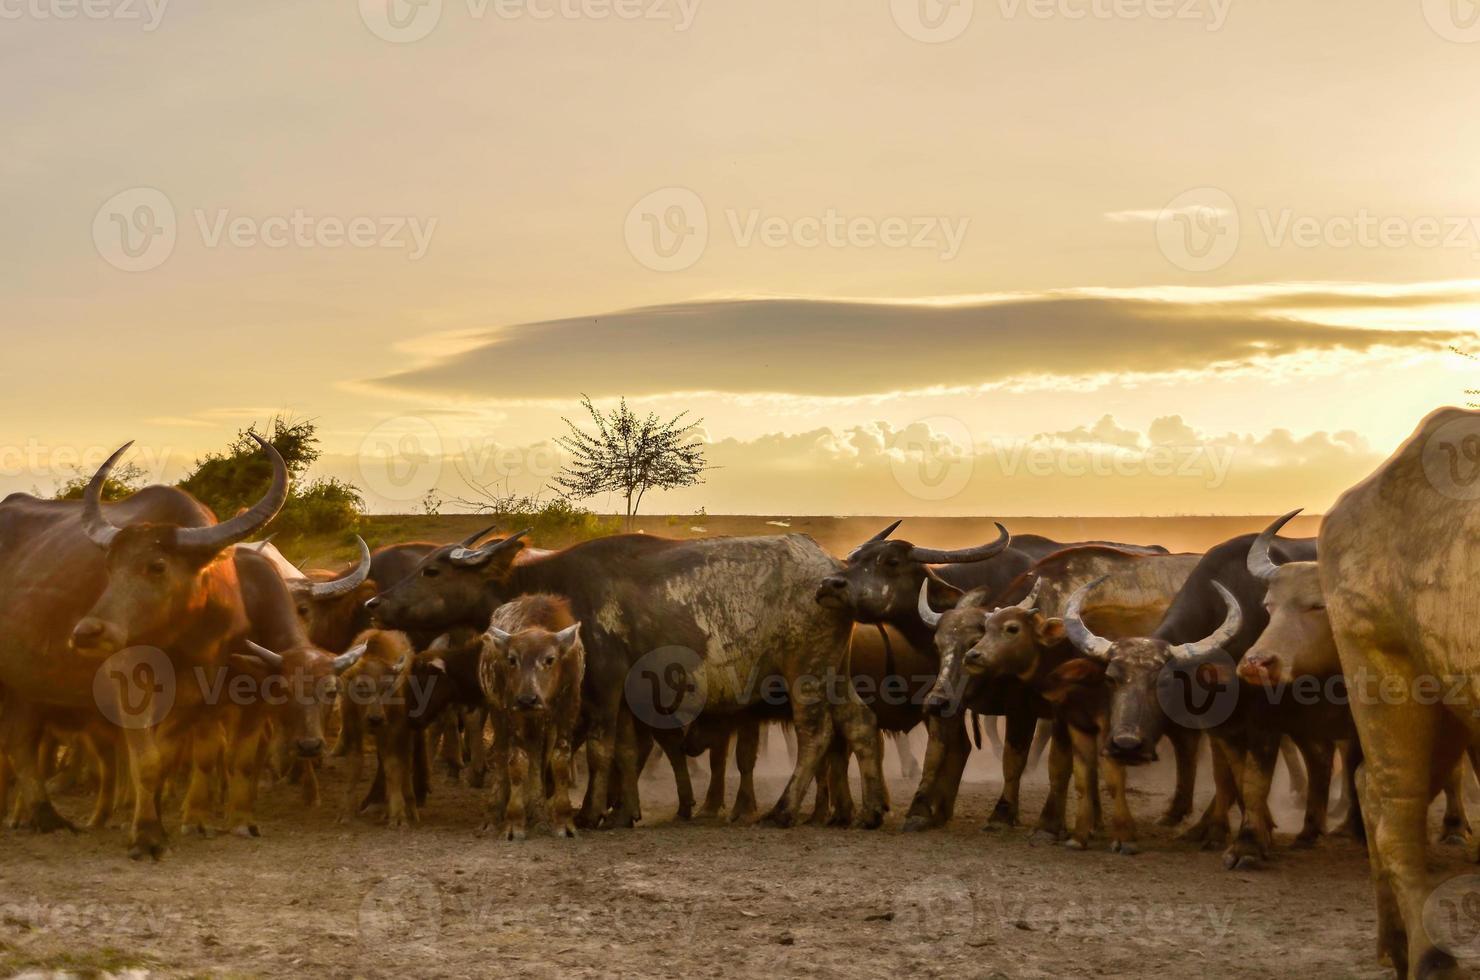 masse di bufali thailandesi foto